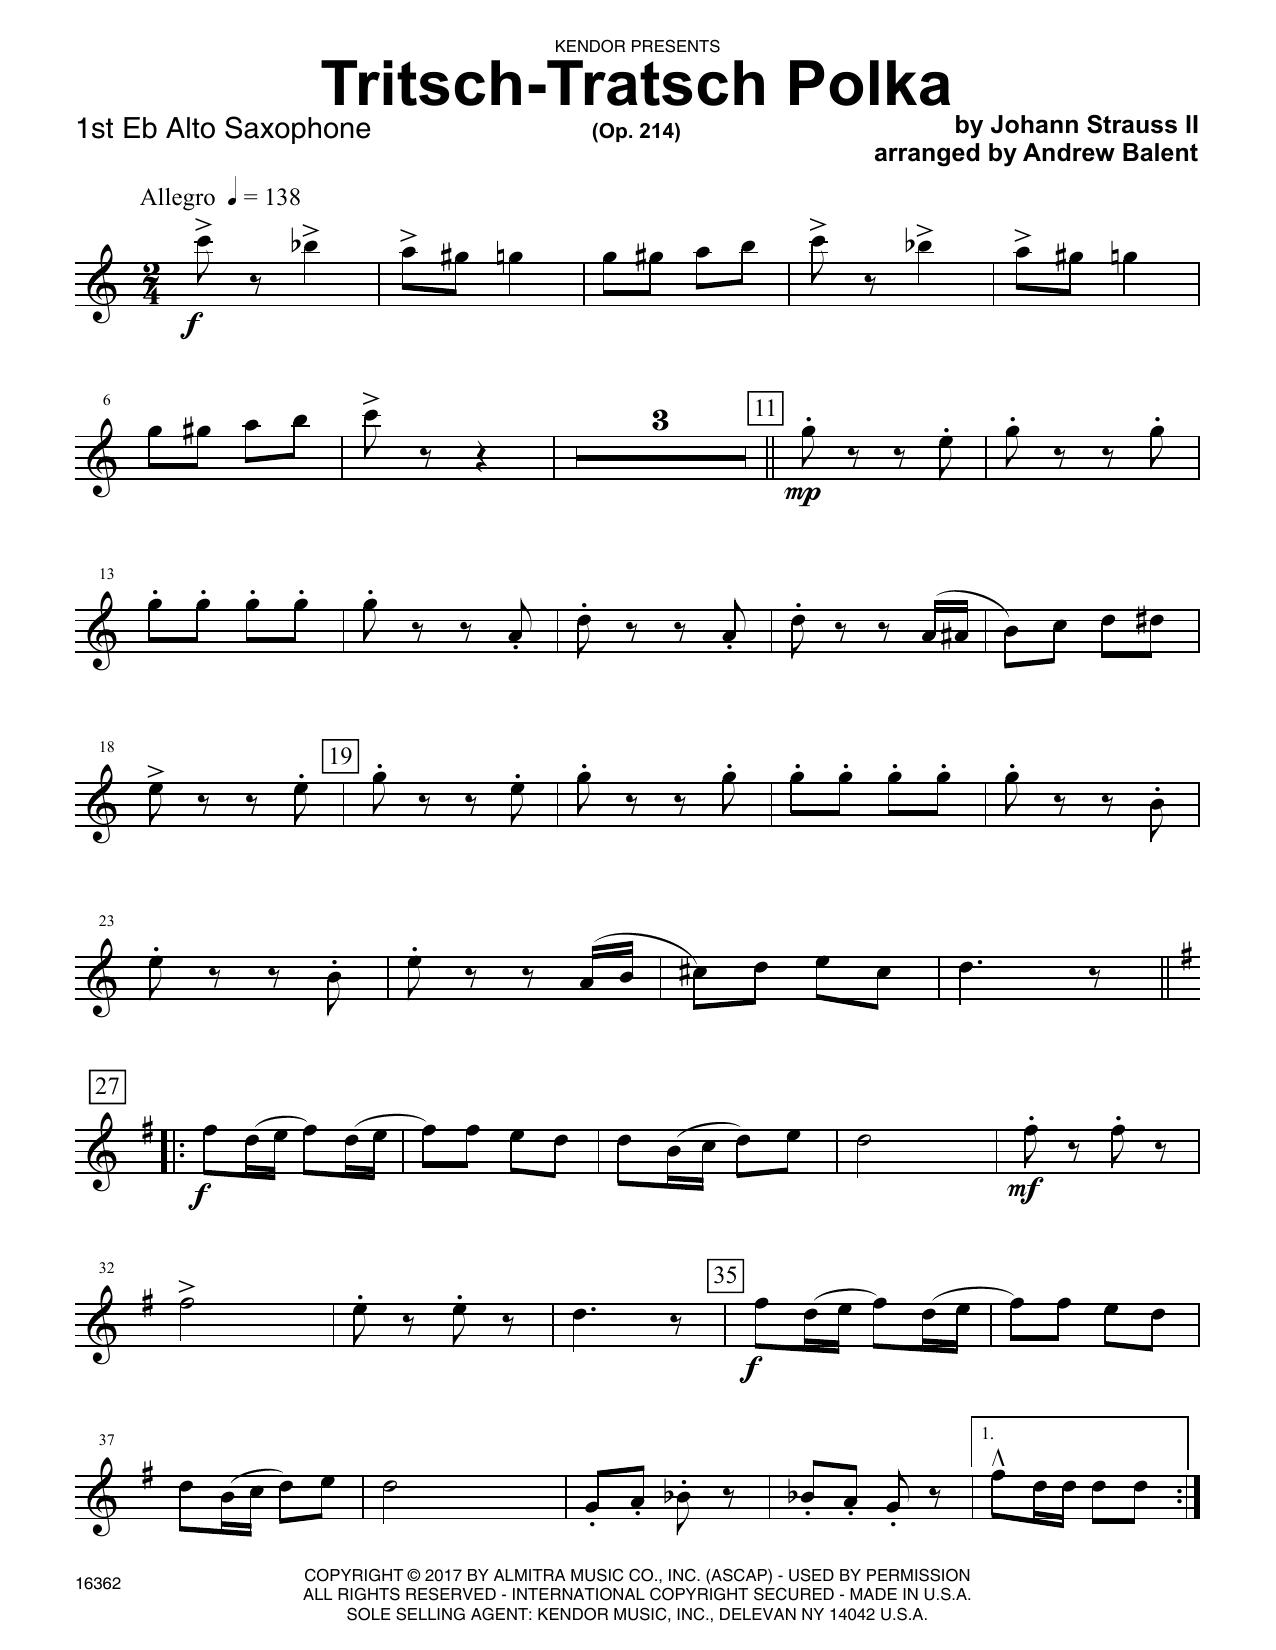 Andrew Balent Tritsch-Tratsch Polka (Op. 214) - 1st Eb Alto Saxophone sheet music notes printable PDF score